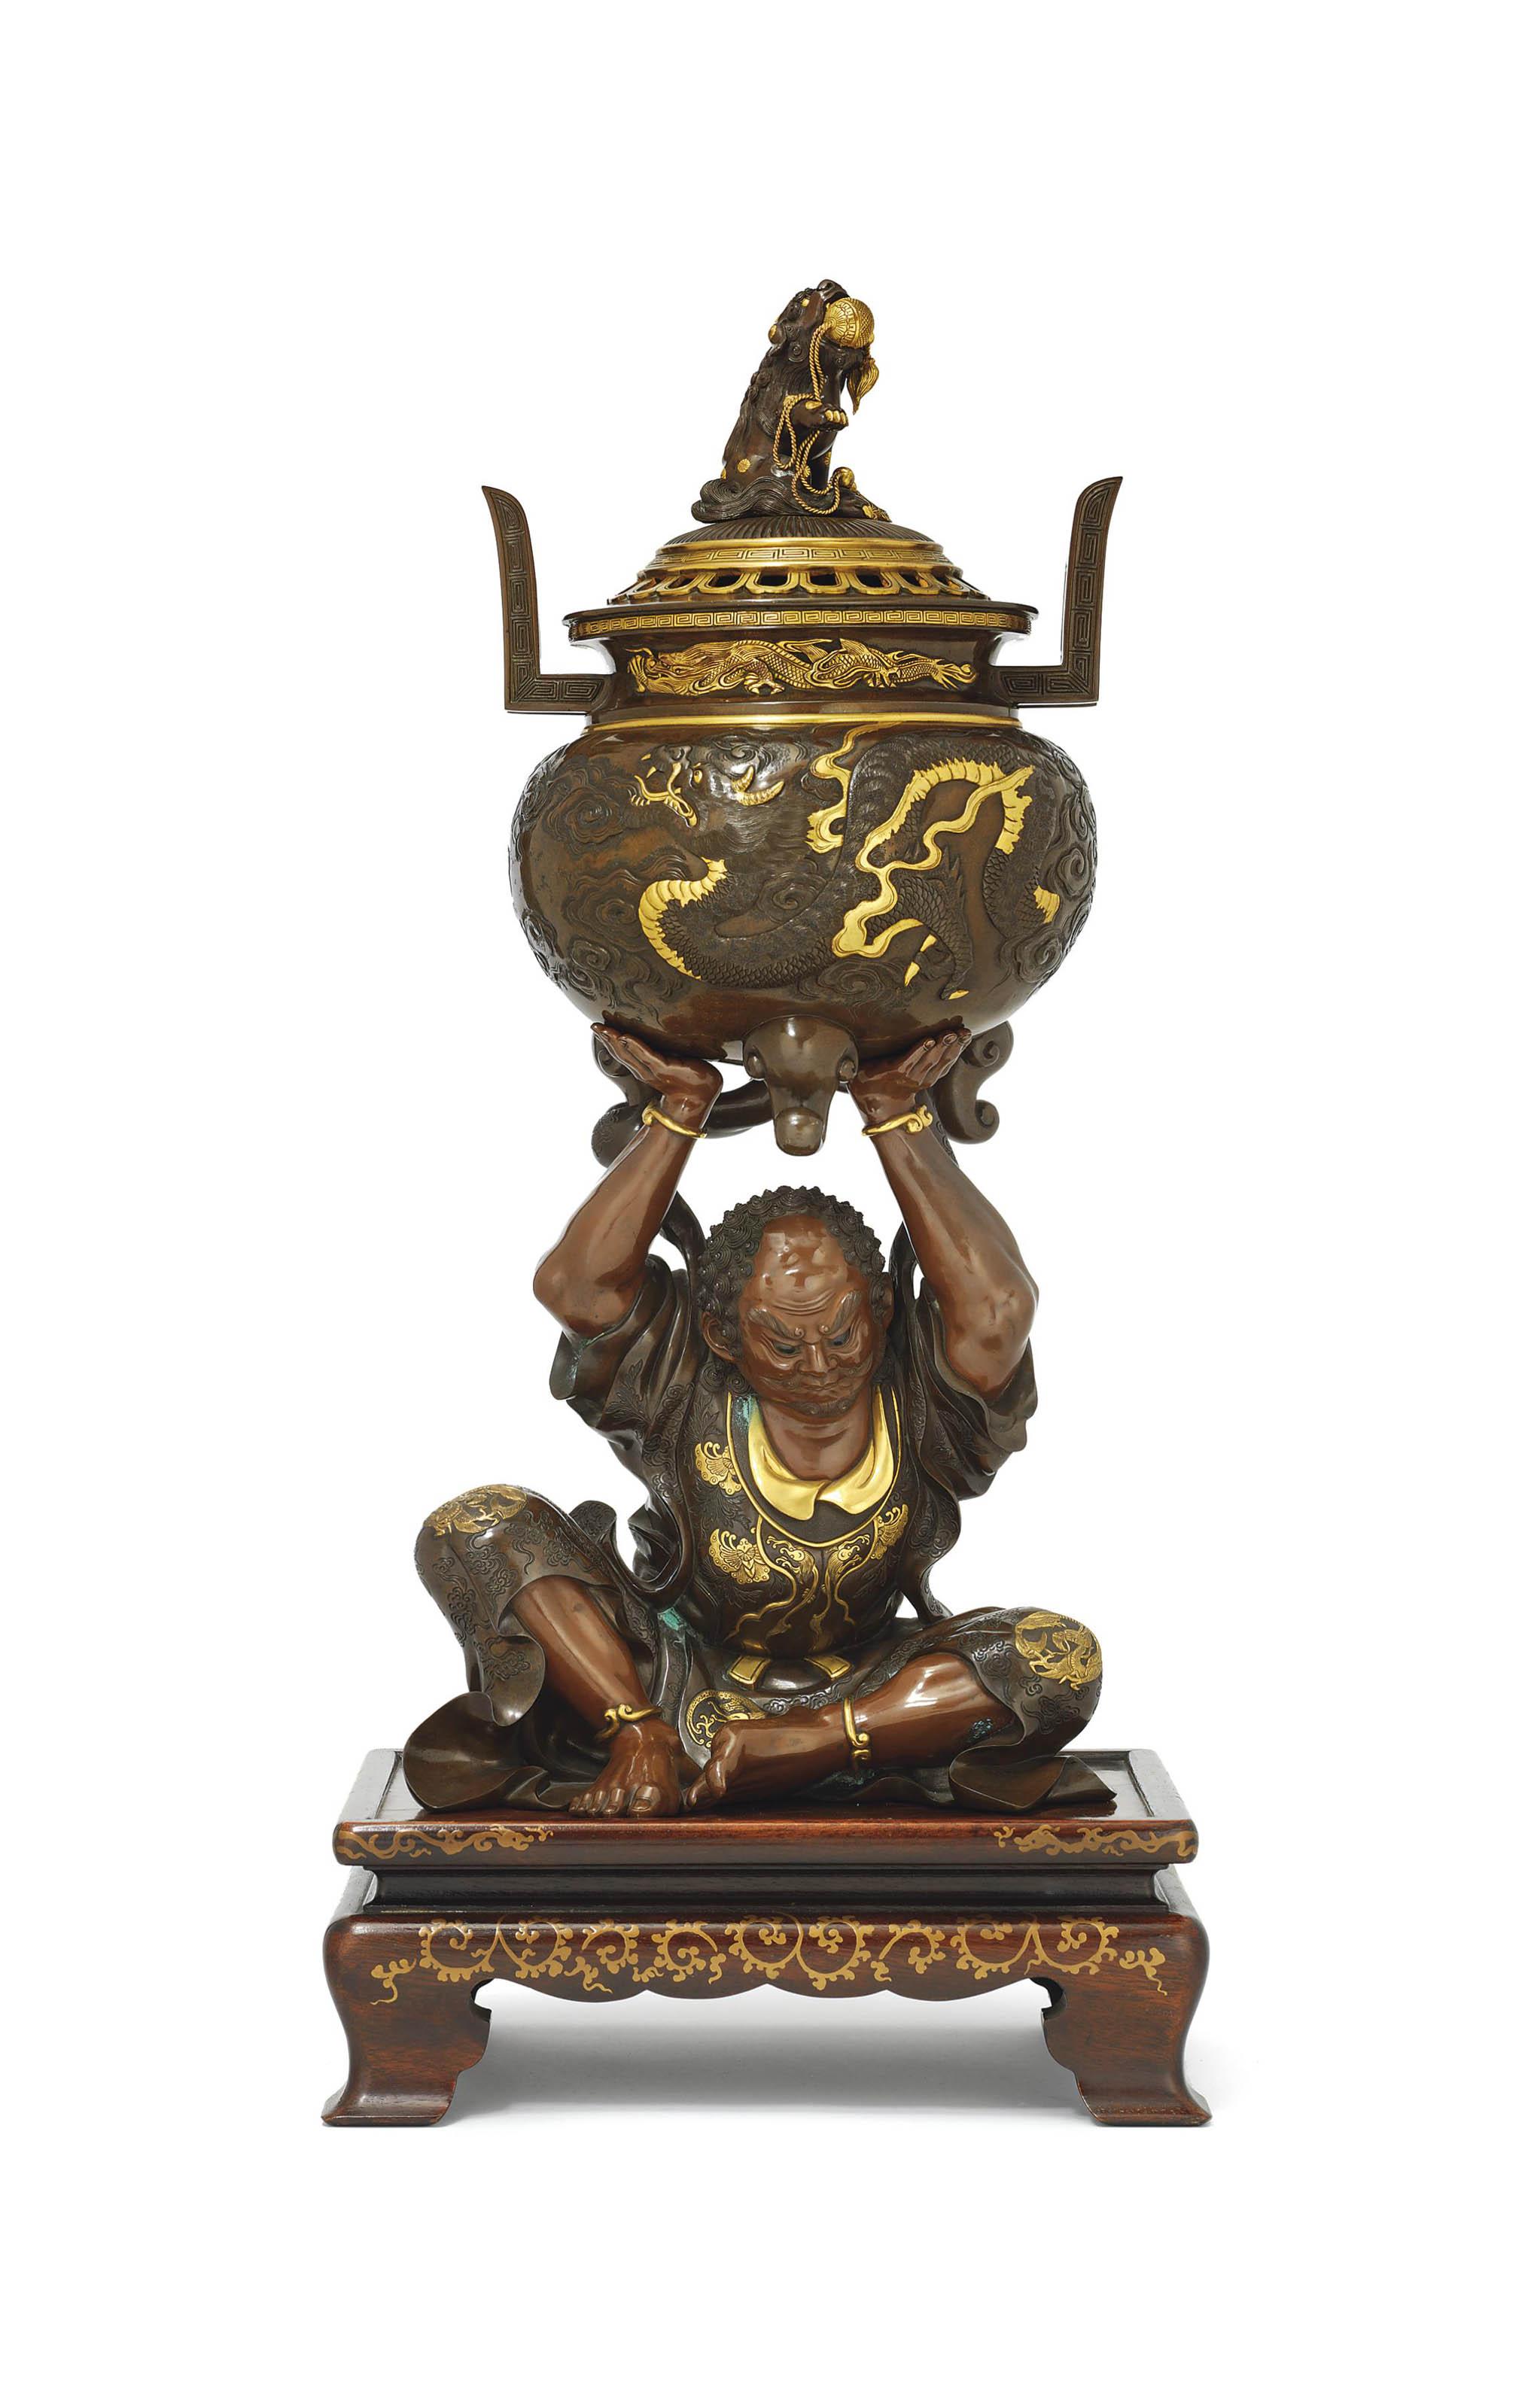 A Fine Large Bronze Koro [Incense Burner]